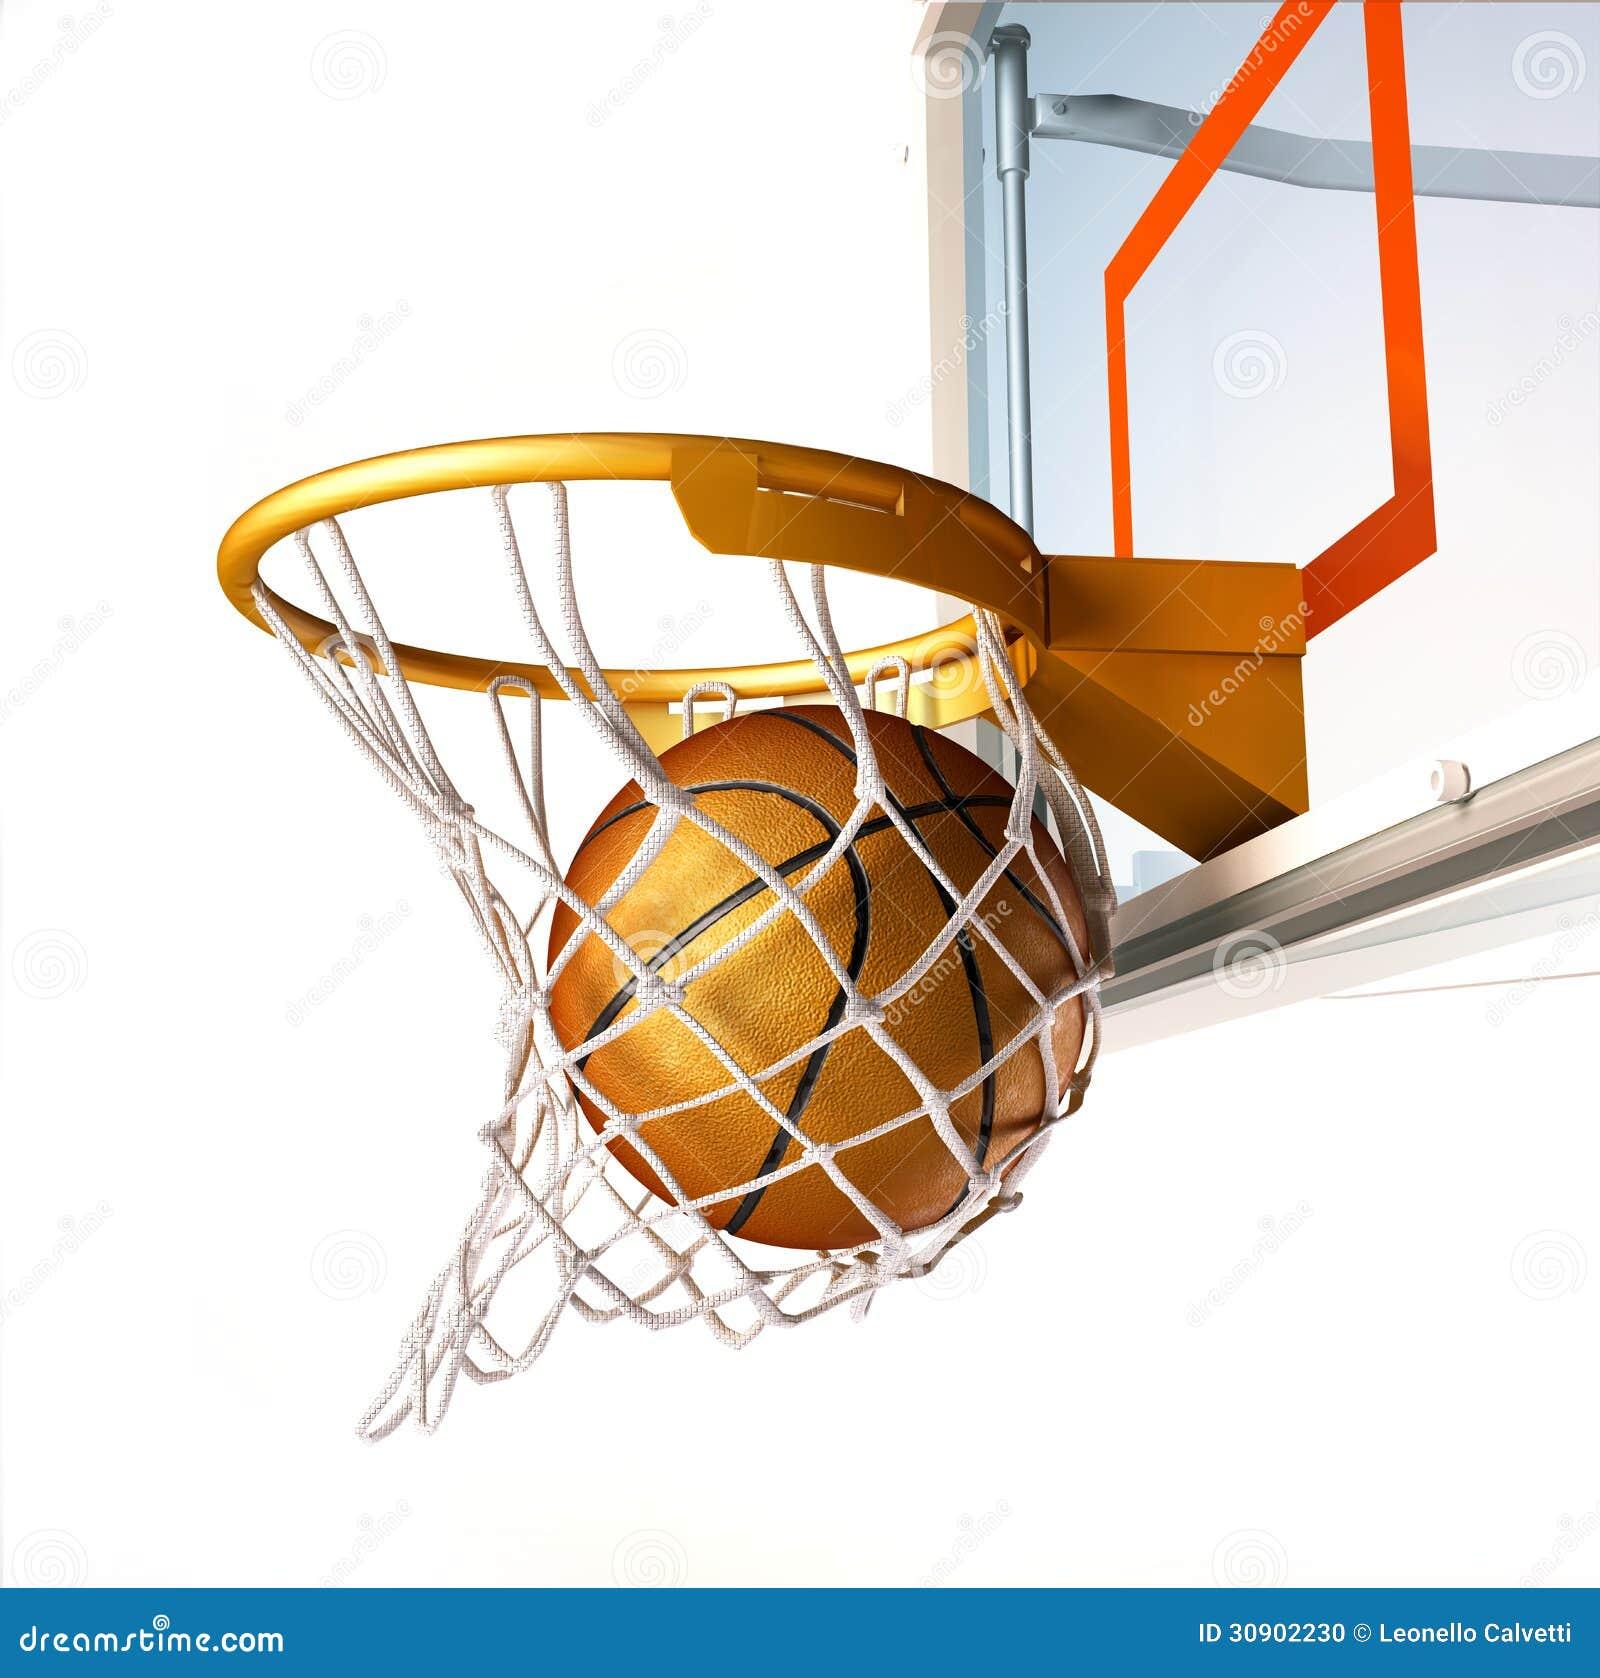 Basketball centering the basket close up view stock - Panier de basket mural ...